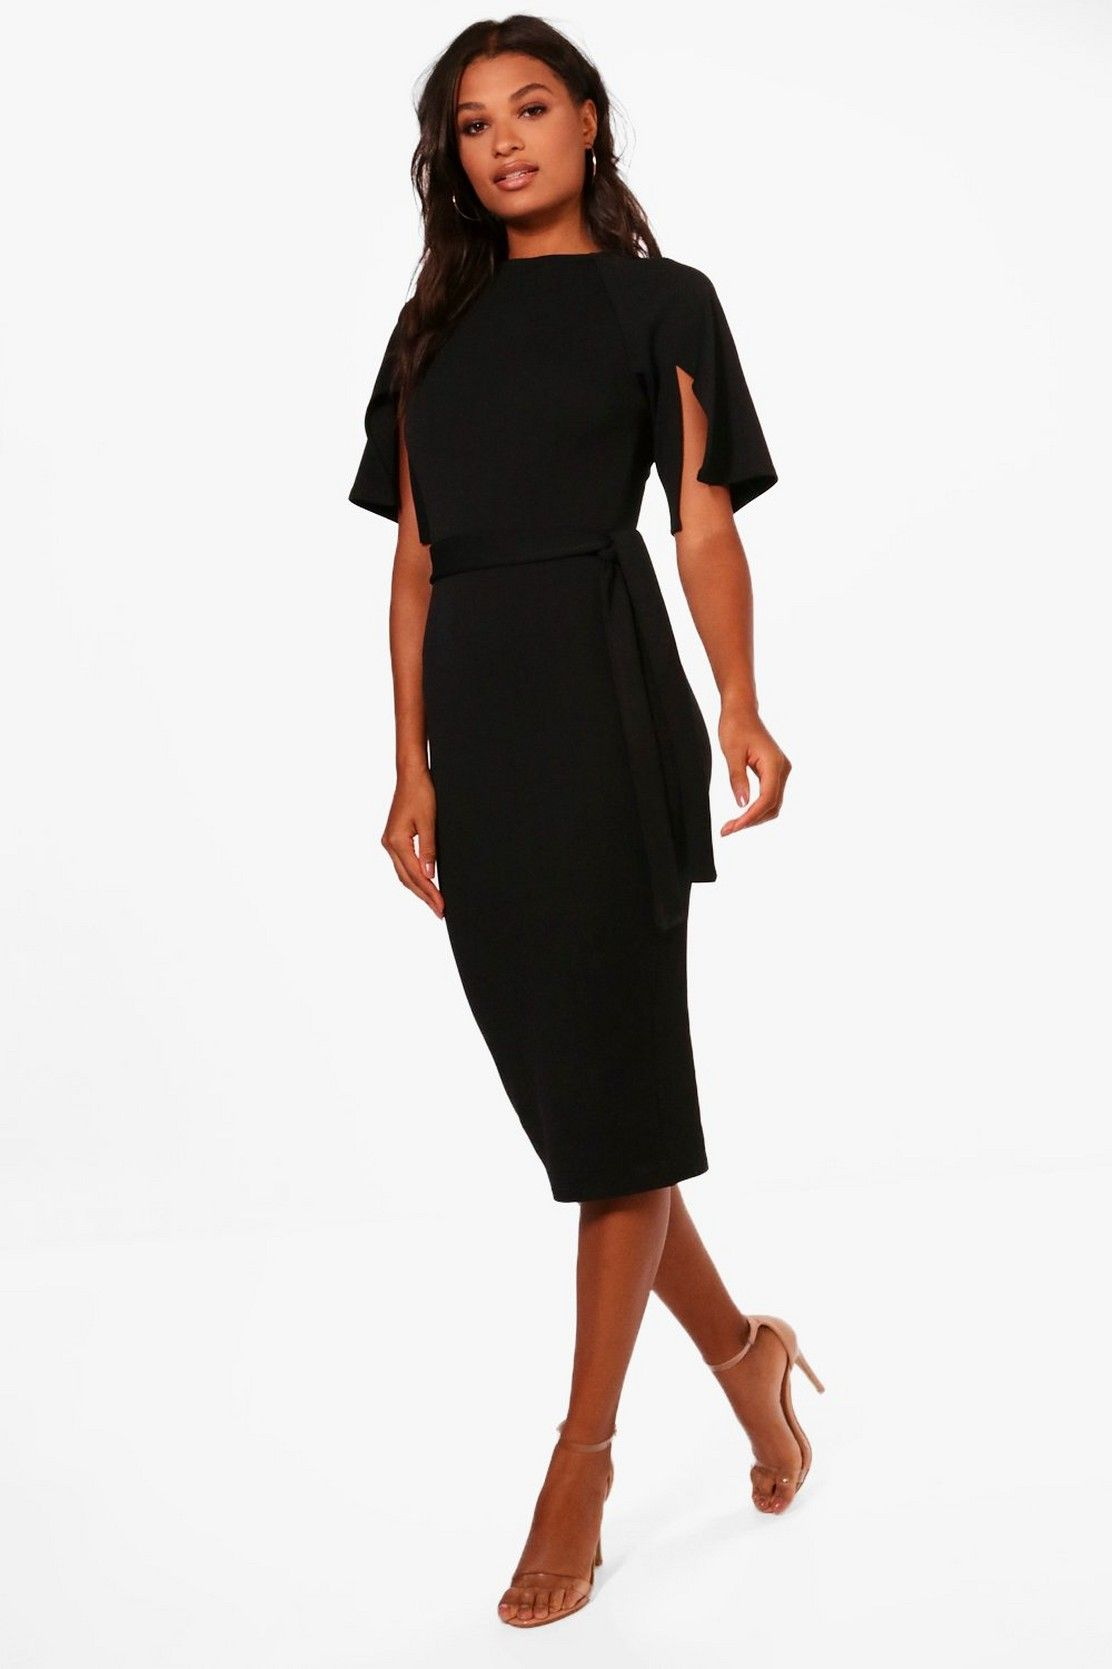 c68c3a07ce57 Split Sleeve Tie Waist Wiggle Midi Dress in 2019 | Style // Finds ...